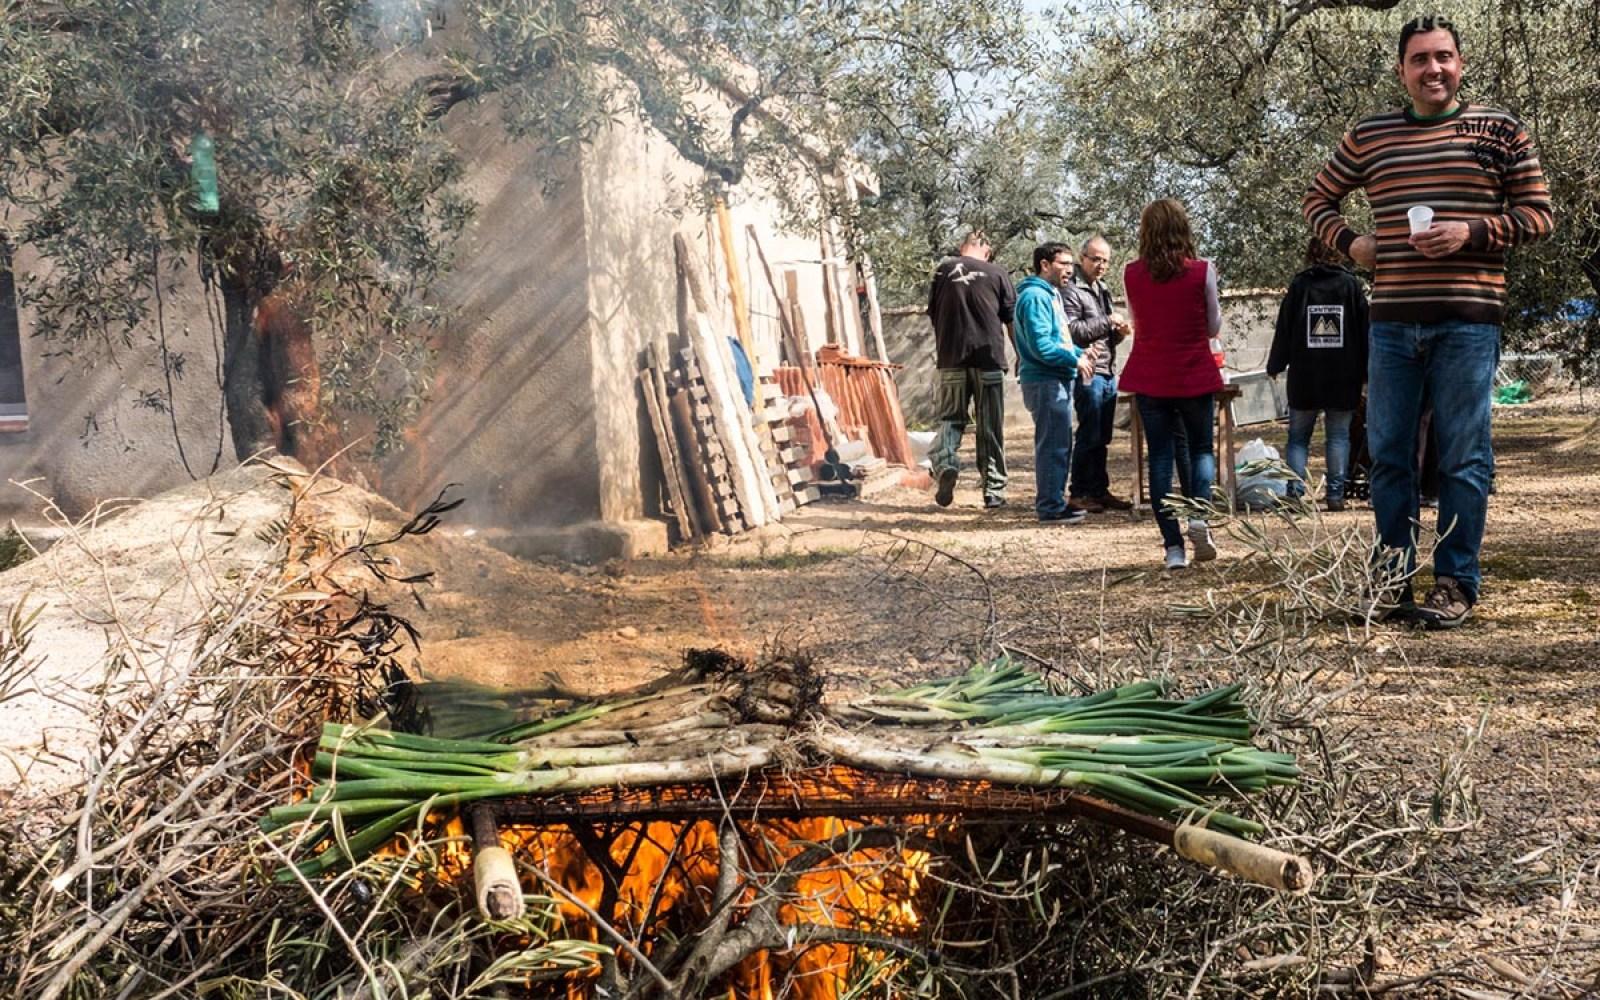 Calçots on the Fire